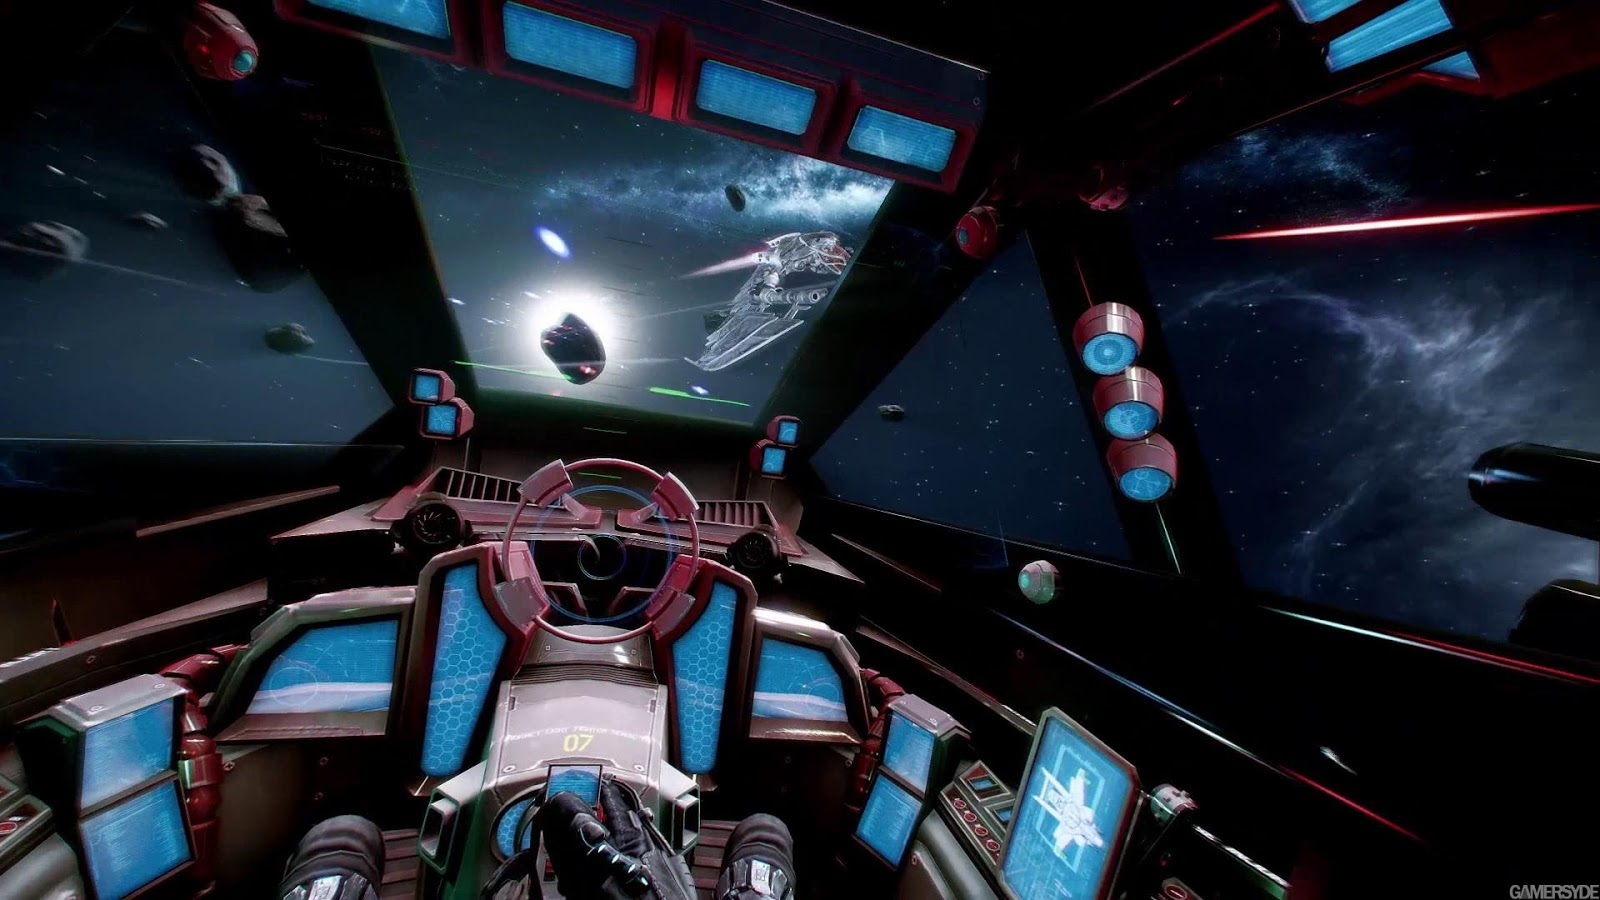 spacecraft computer game - photo #13